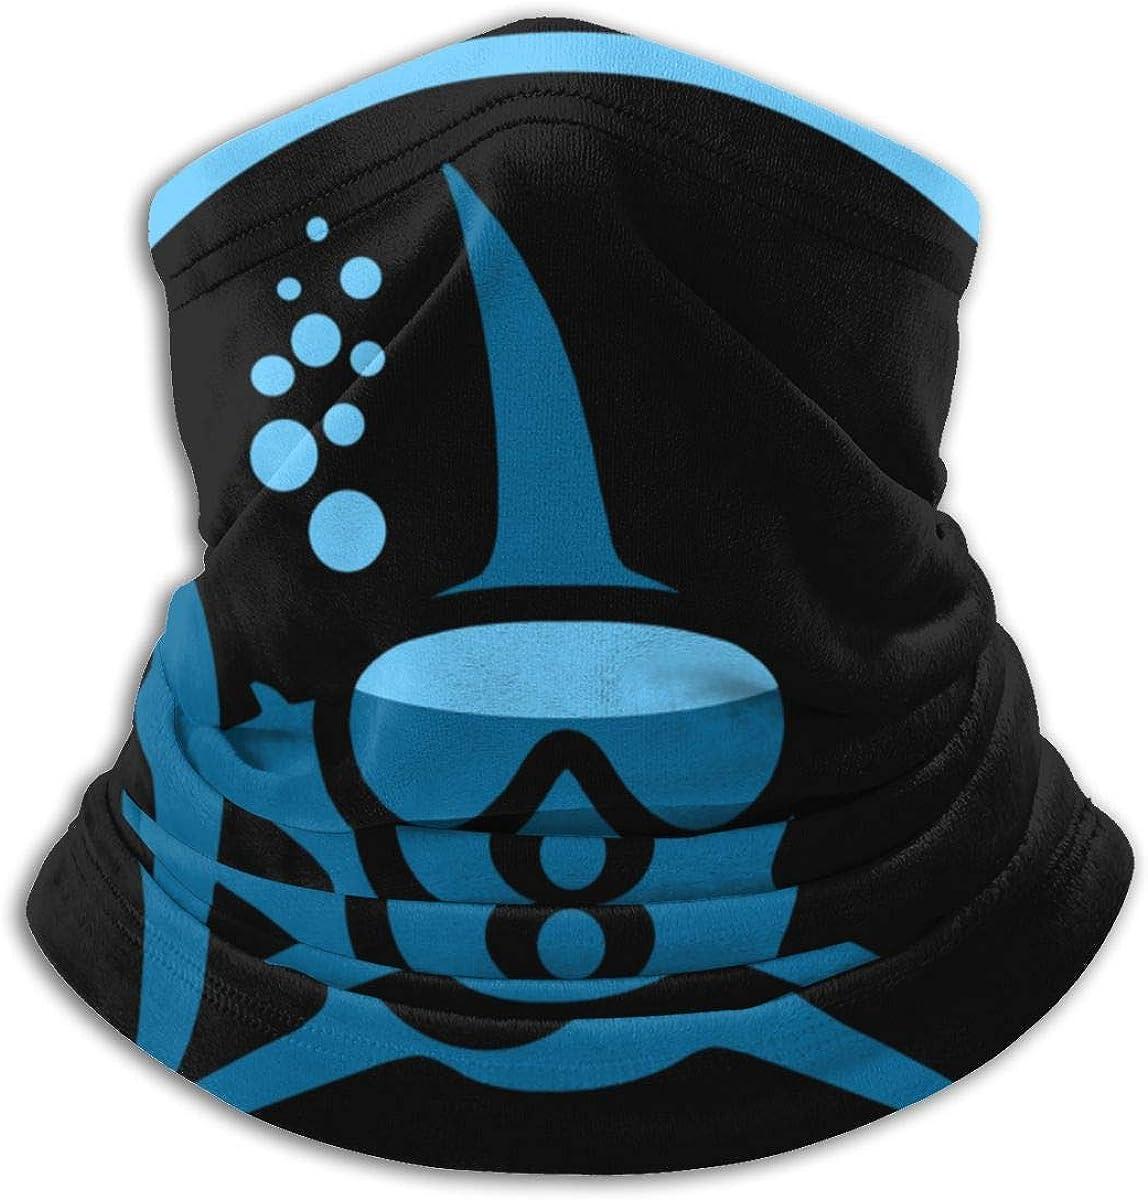 Fuck Skull Seamless Face Mask Bandanas, Multifunctional Neck Gaiter Shield Scarf for Outdoor, Sport